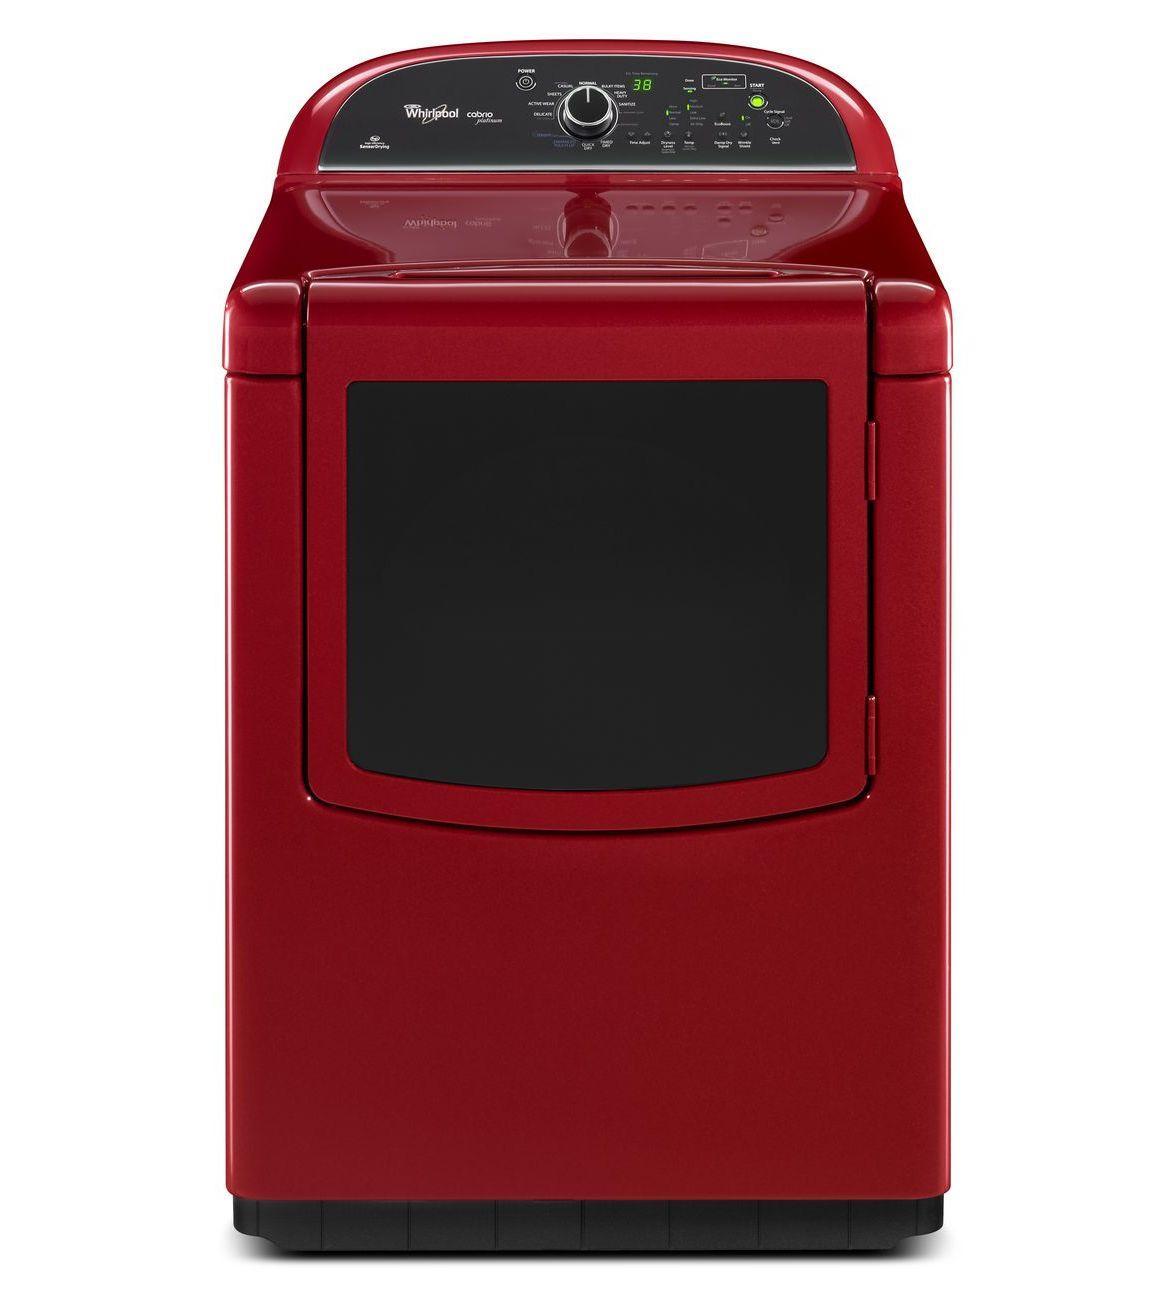 Wgd8500bc Whirlpool Wgd8500bc Cabrio Gas Dryers